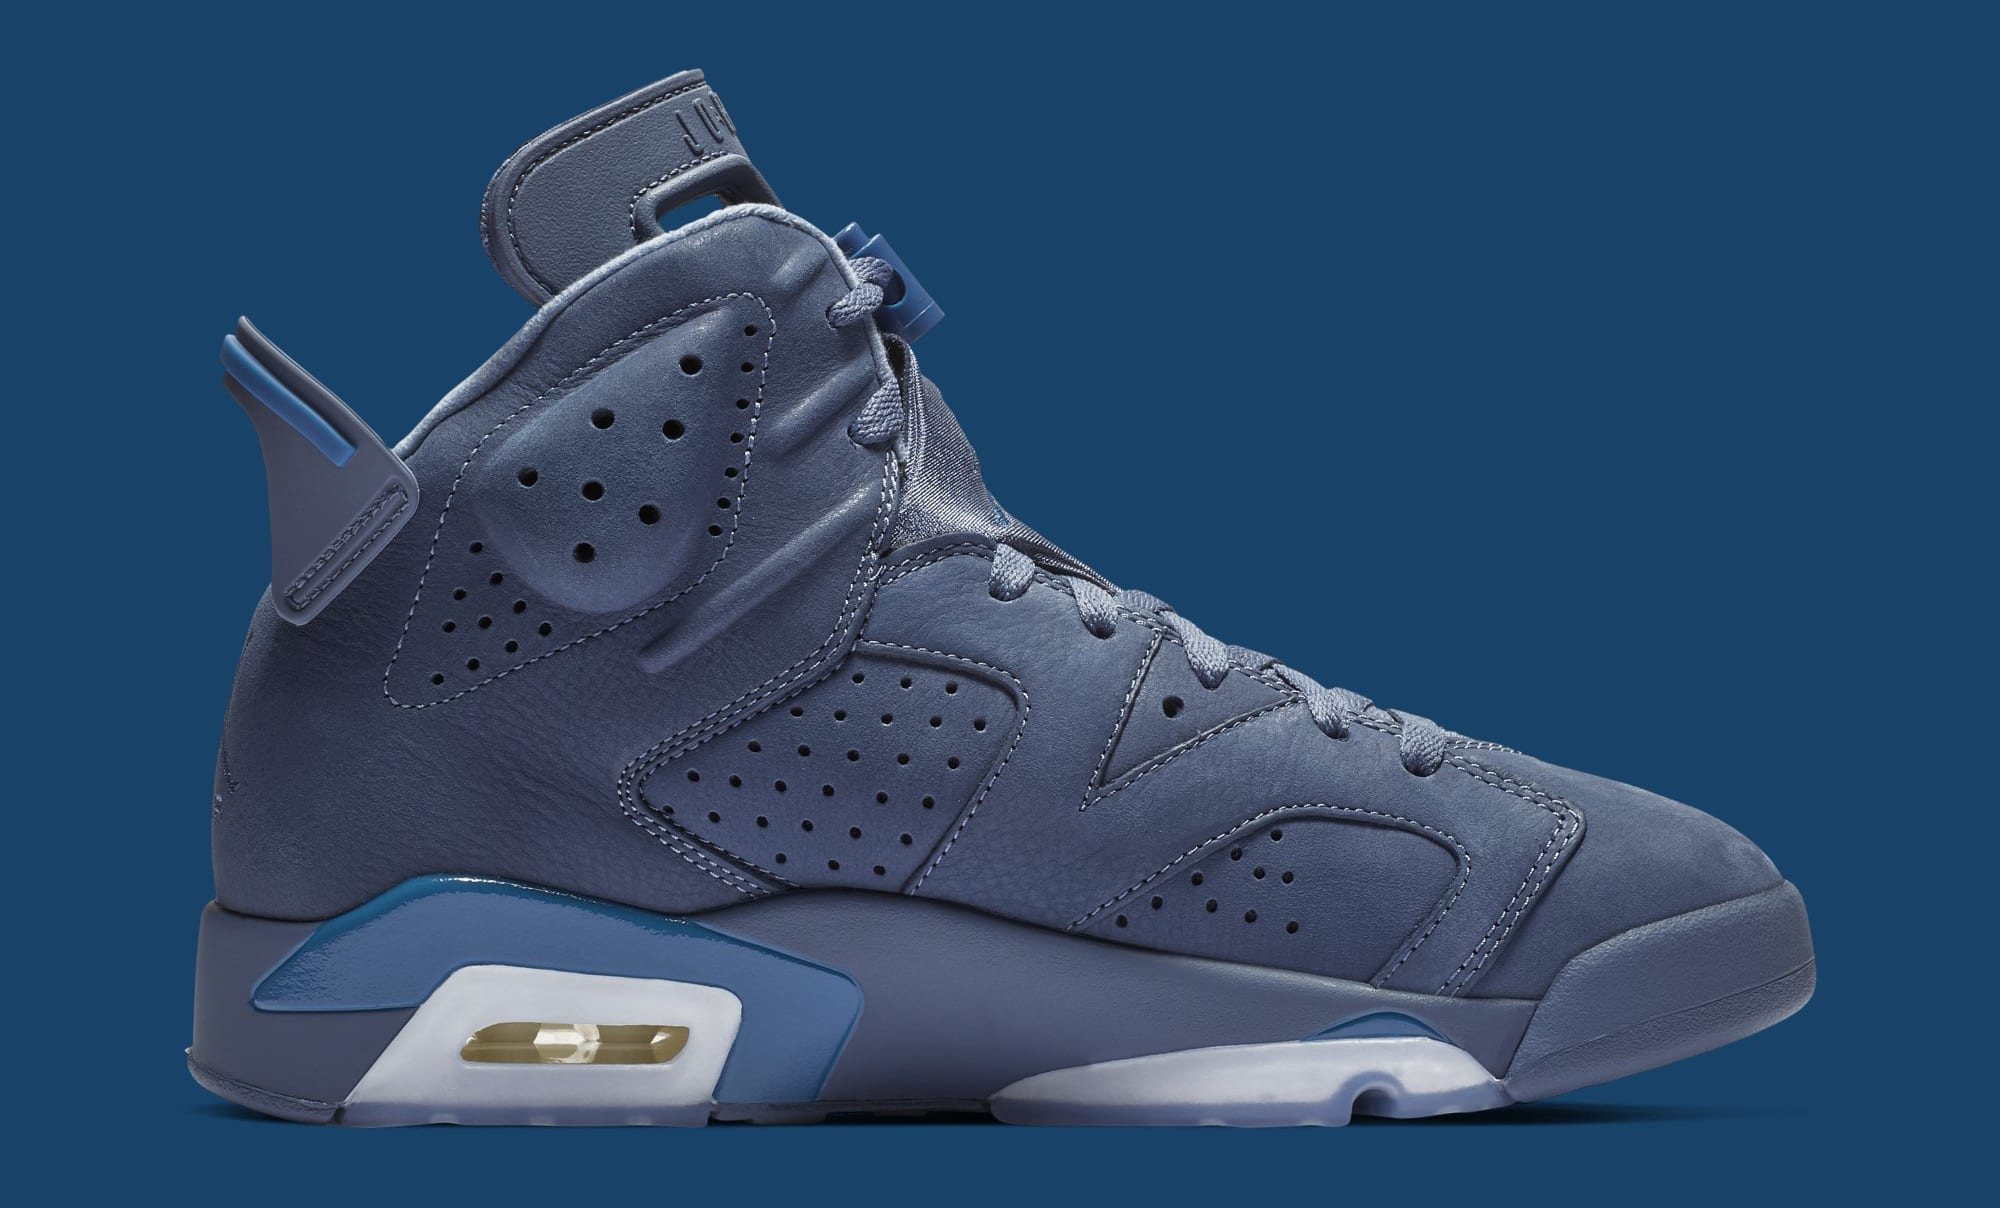 235d8372e356ba Nike Air Jordan 6 Retro Diffused Blue Jimmy Butler PE VI AJ6 384664 ...